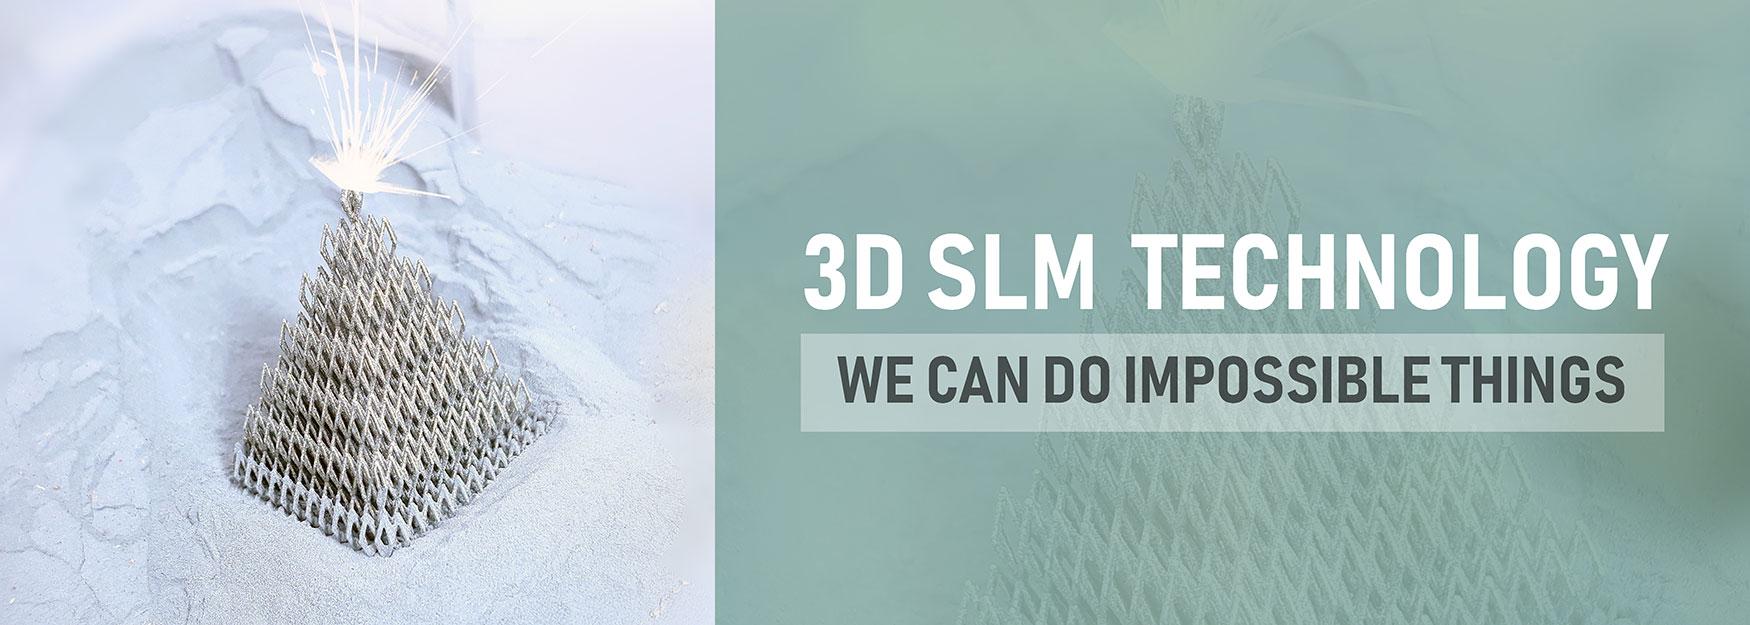 3D SLM technology